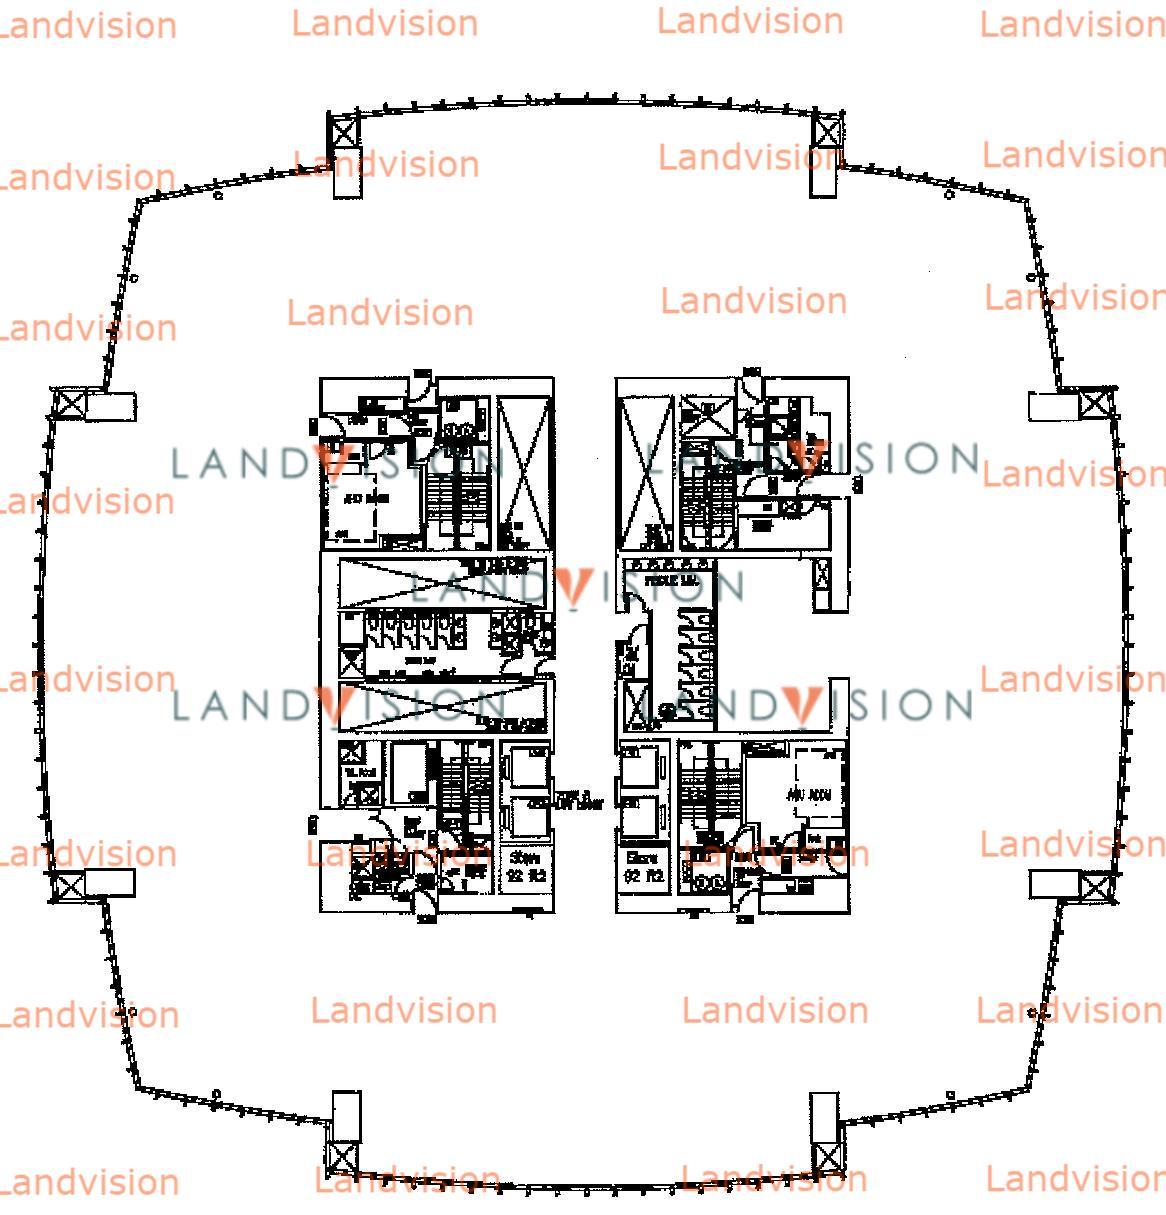 https://www.landvision.com.hk/wp-content/uploads/website/resize/floorplans/001125.JPG